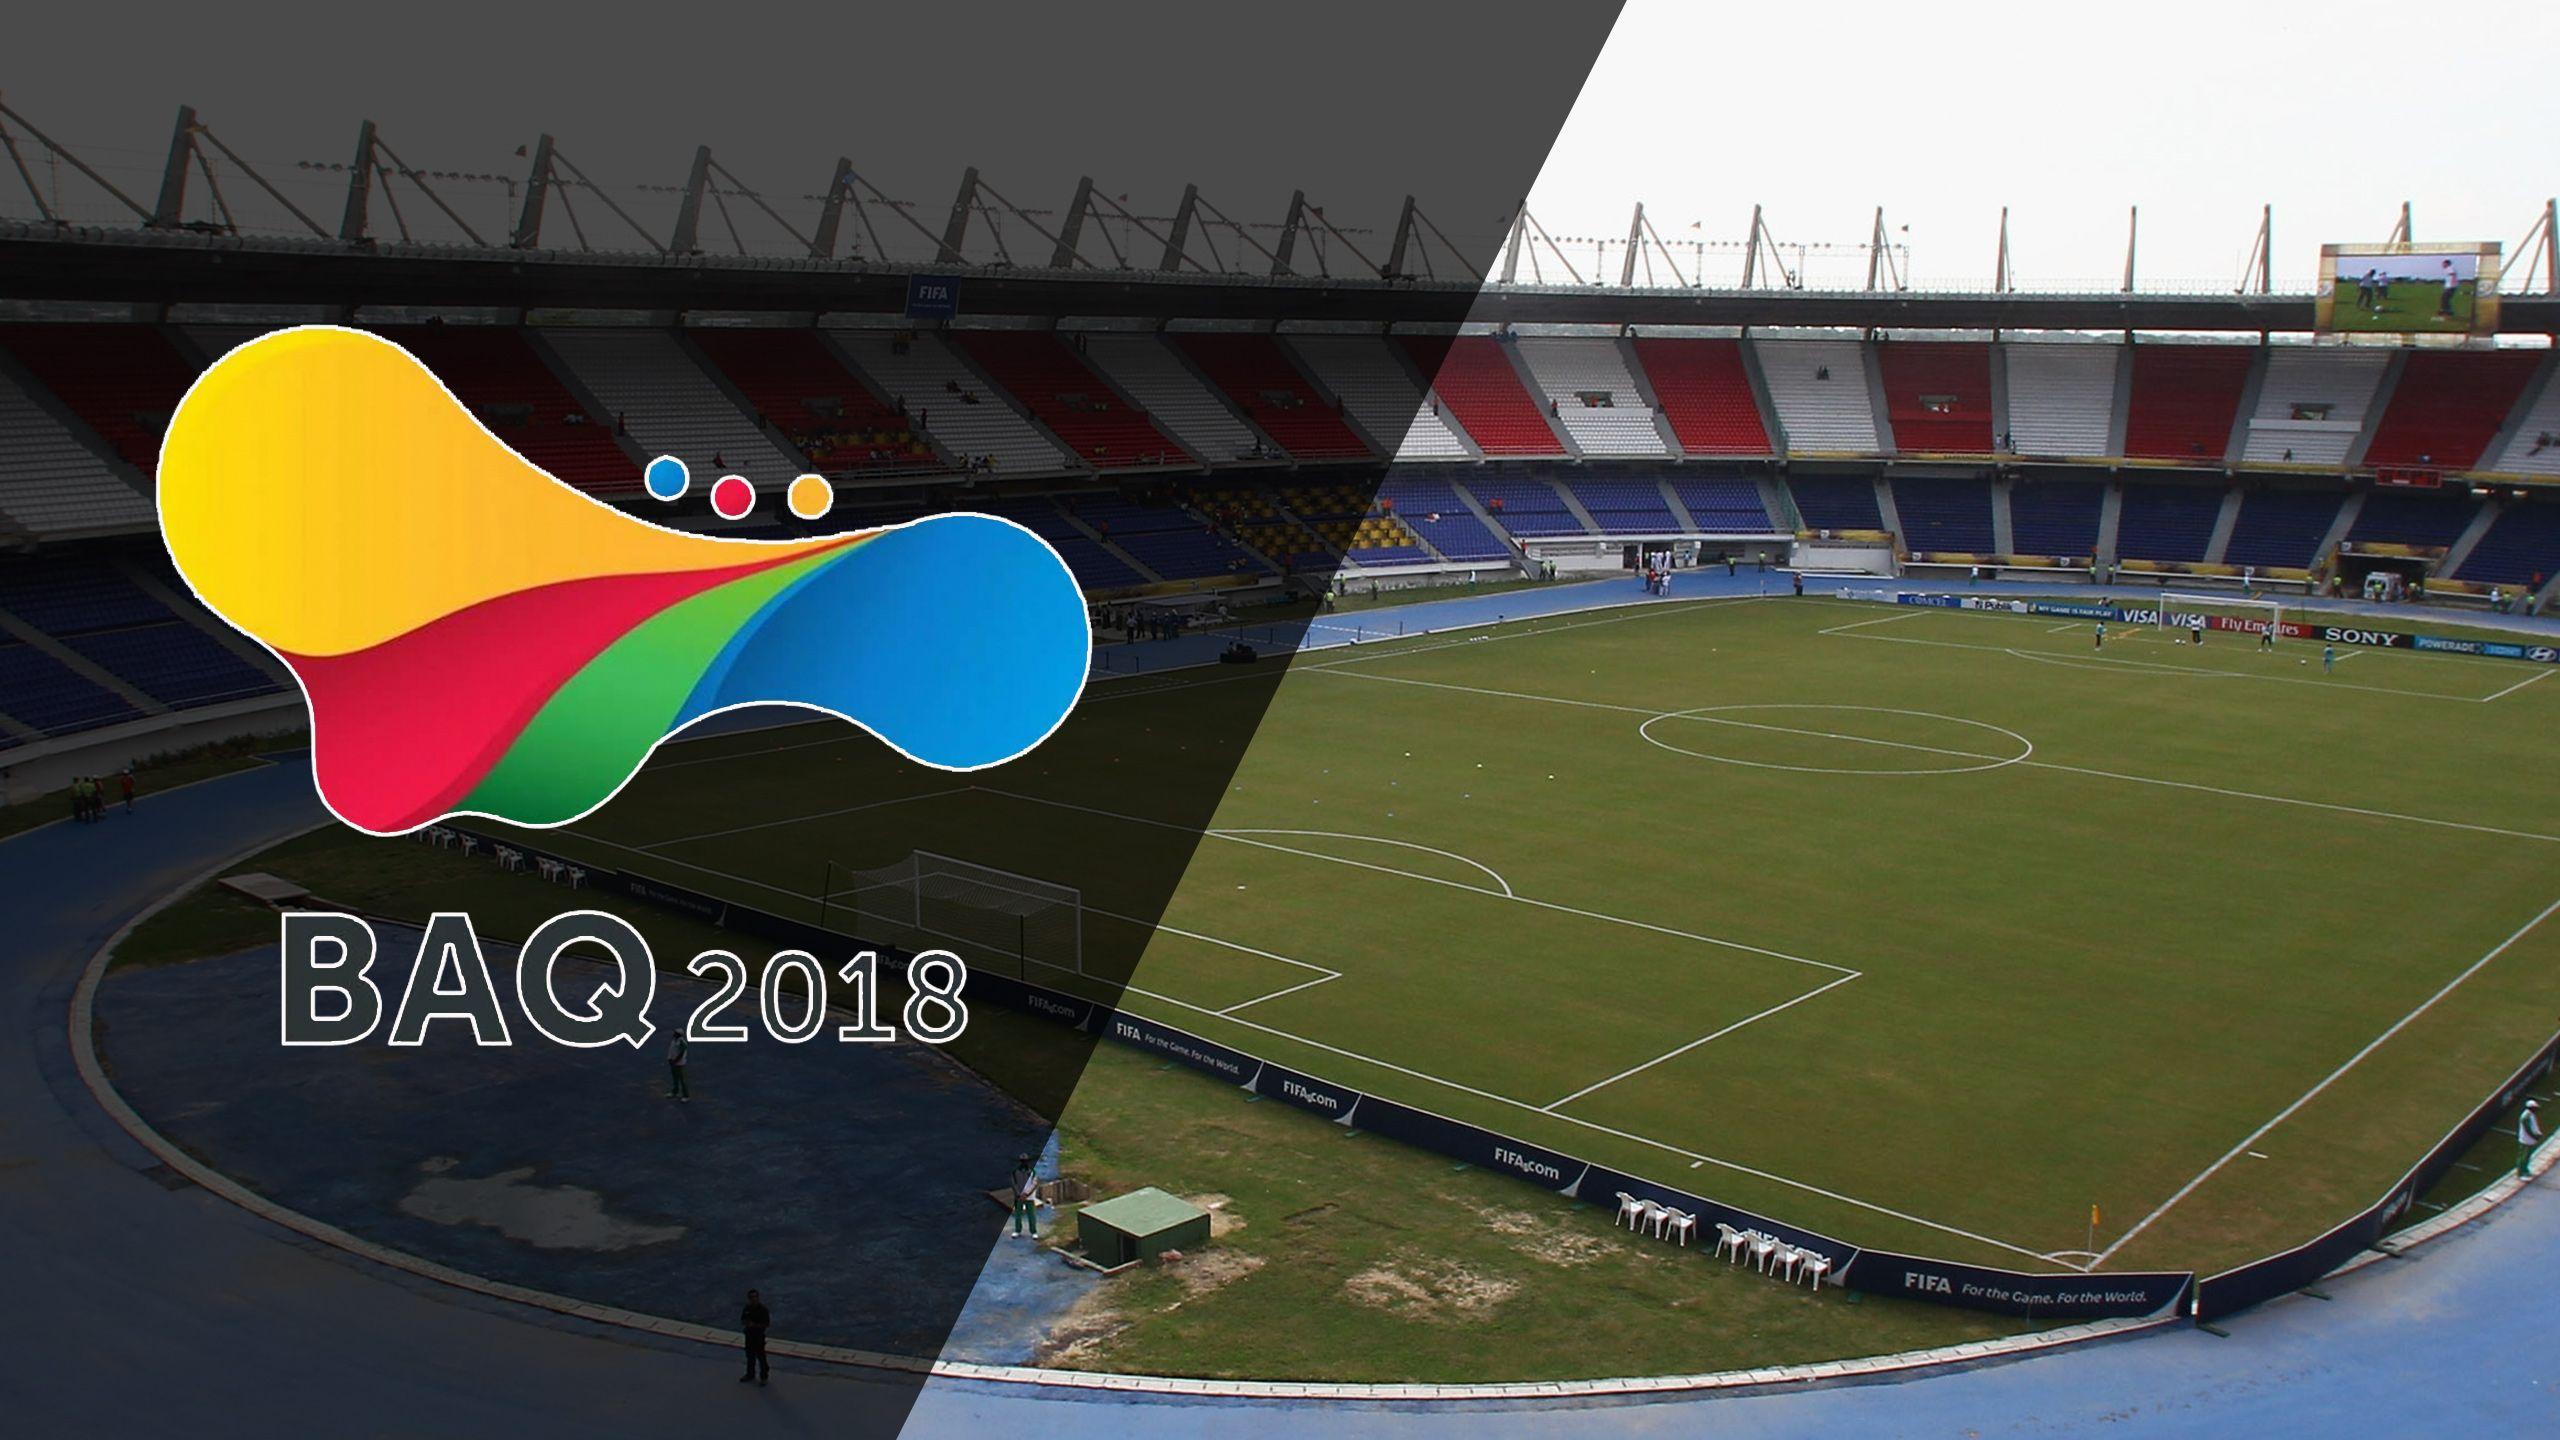 2018 Central American and Caribbean Games - Clavados (Rondas Preliminares)